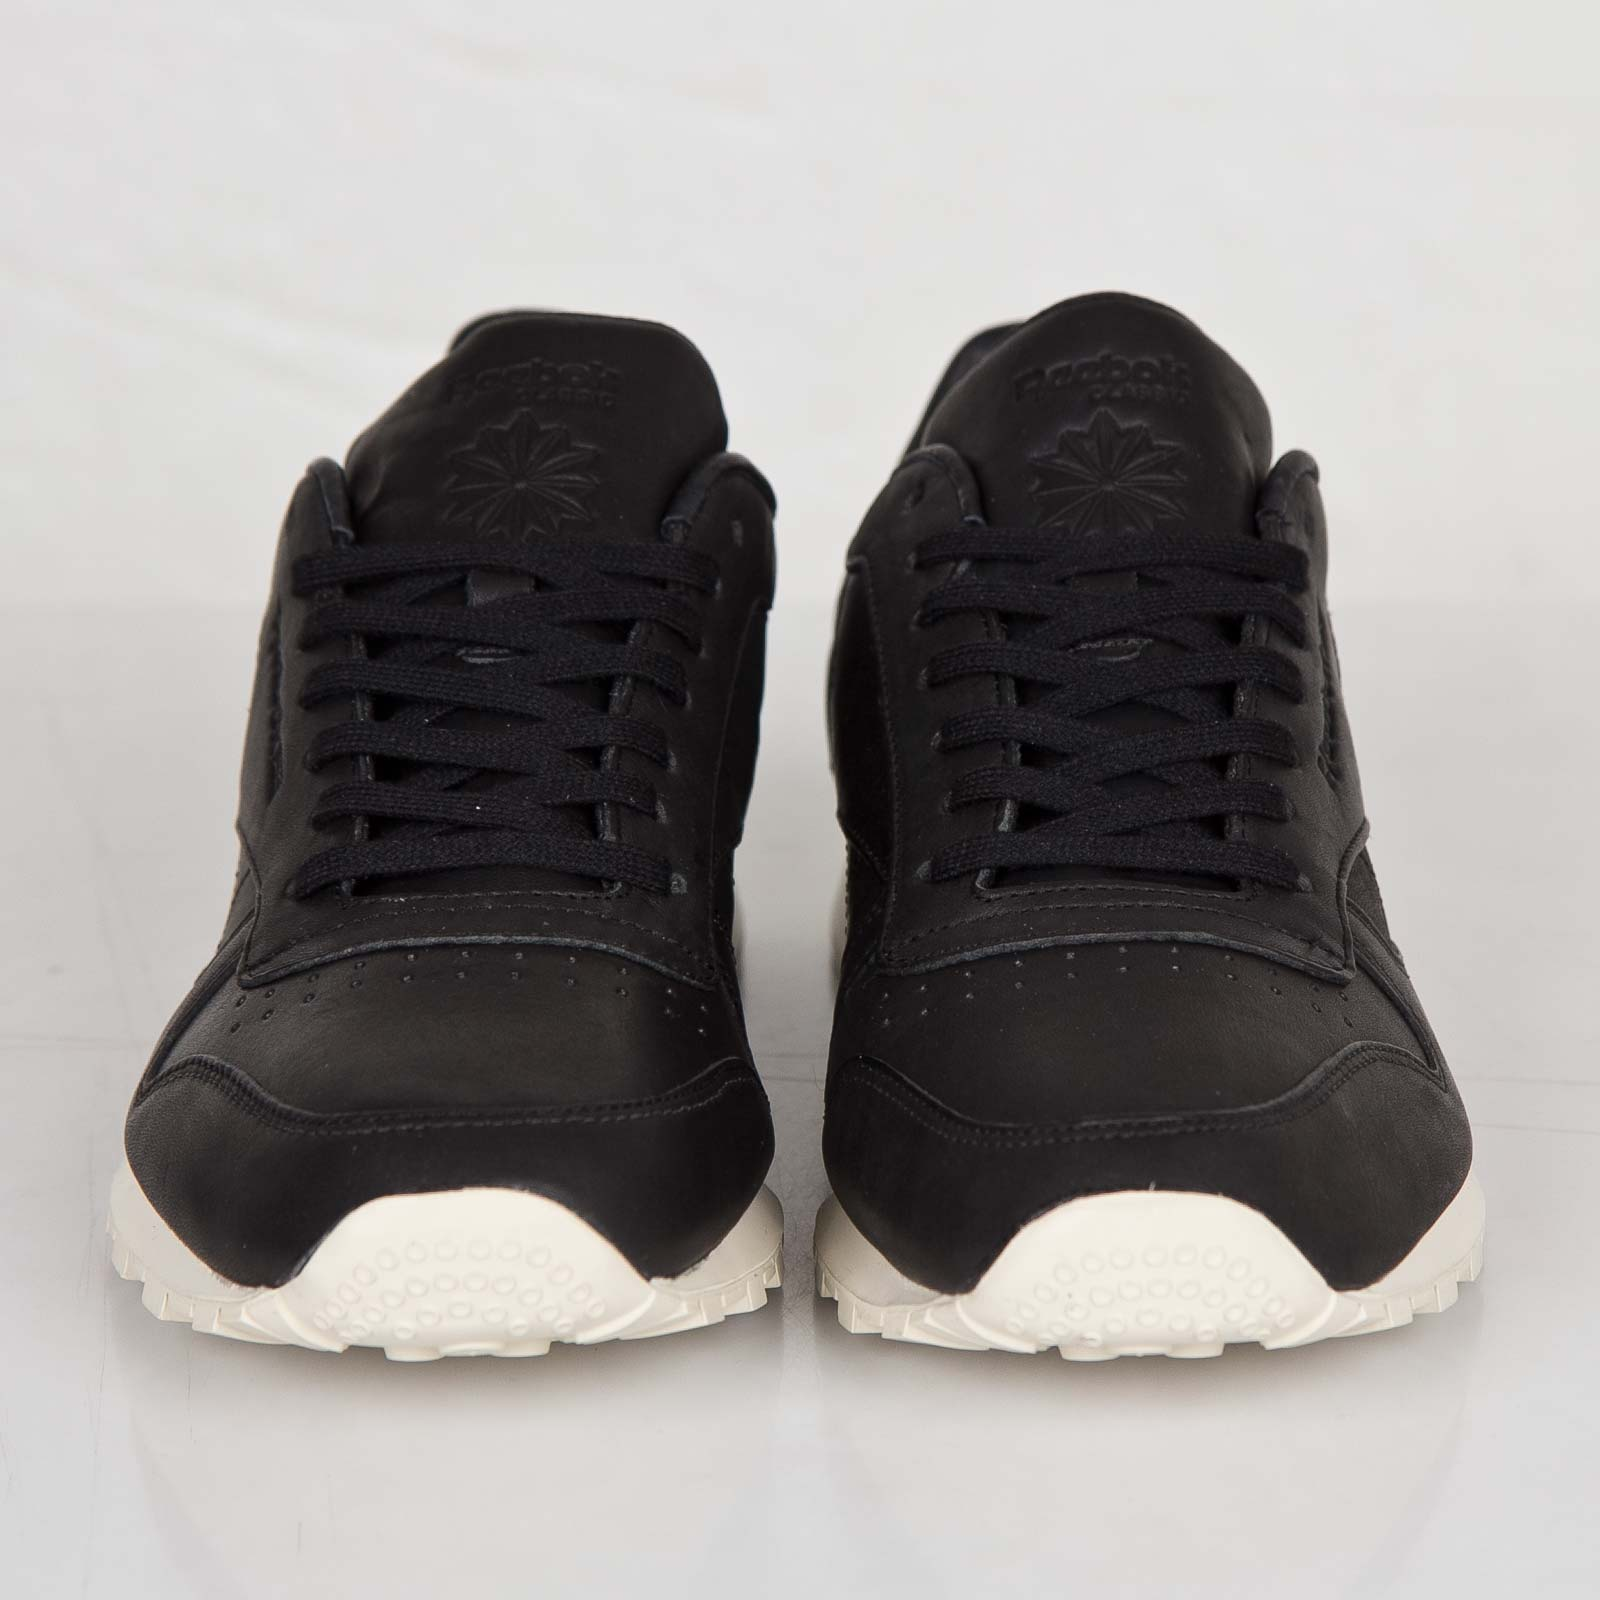 6432653efeb3c Reebok Classic Leather Lux Horween - M47439 - Sneakersnstuff ...